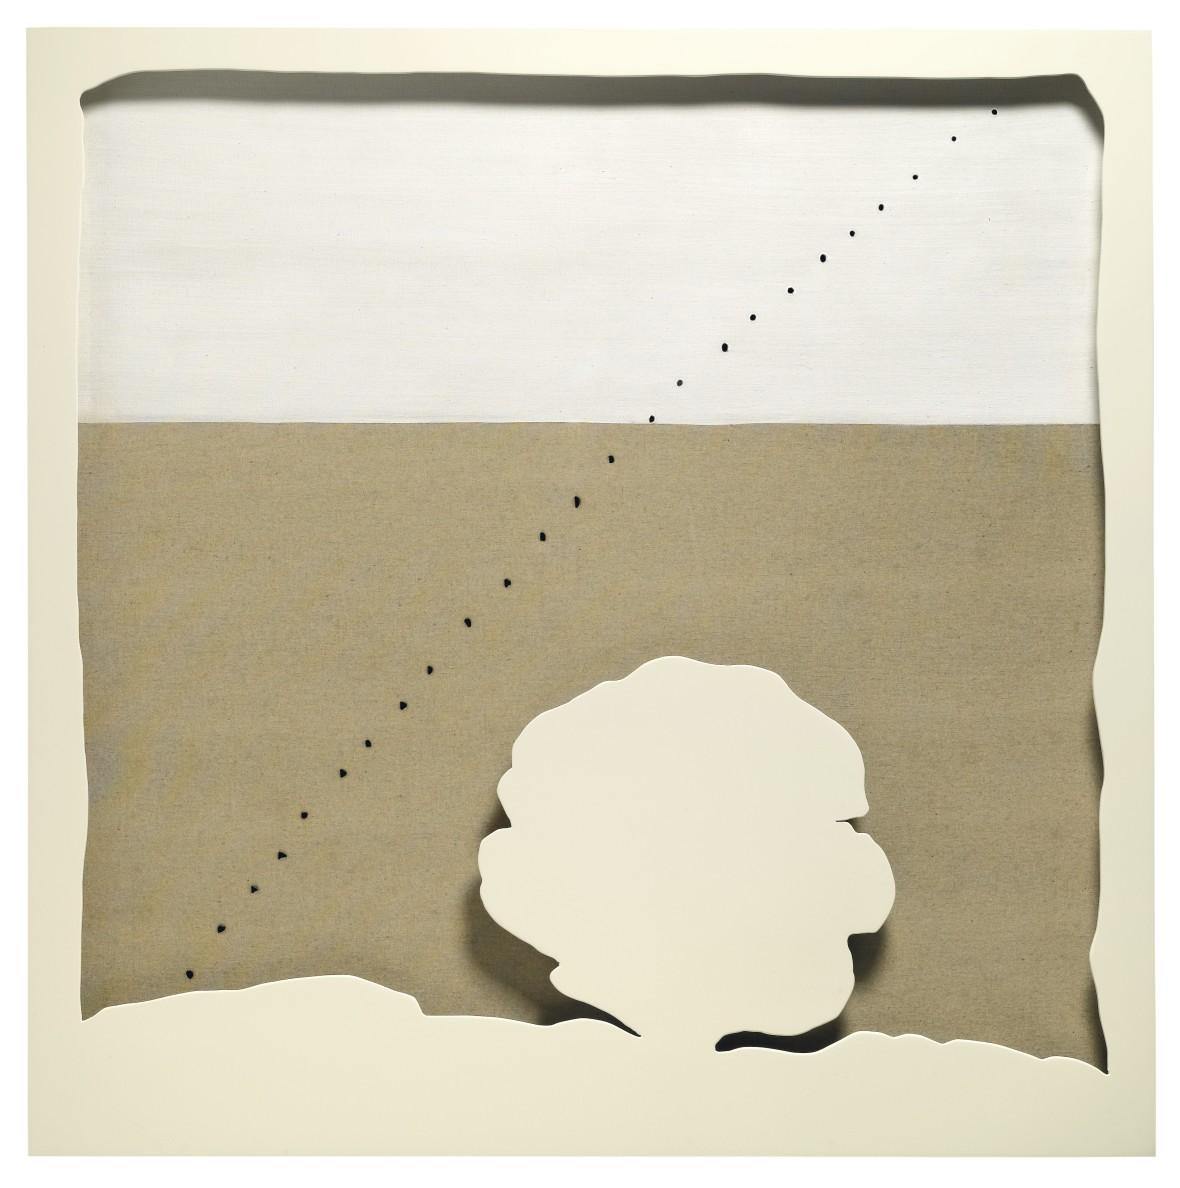 "<p><span class=""artist""><strong>Lucio Fontana</strong></span>,<span class=""title""><em>Concetto Spaziale. Teatrino</em>, 1965</span></p>"